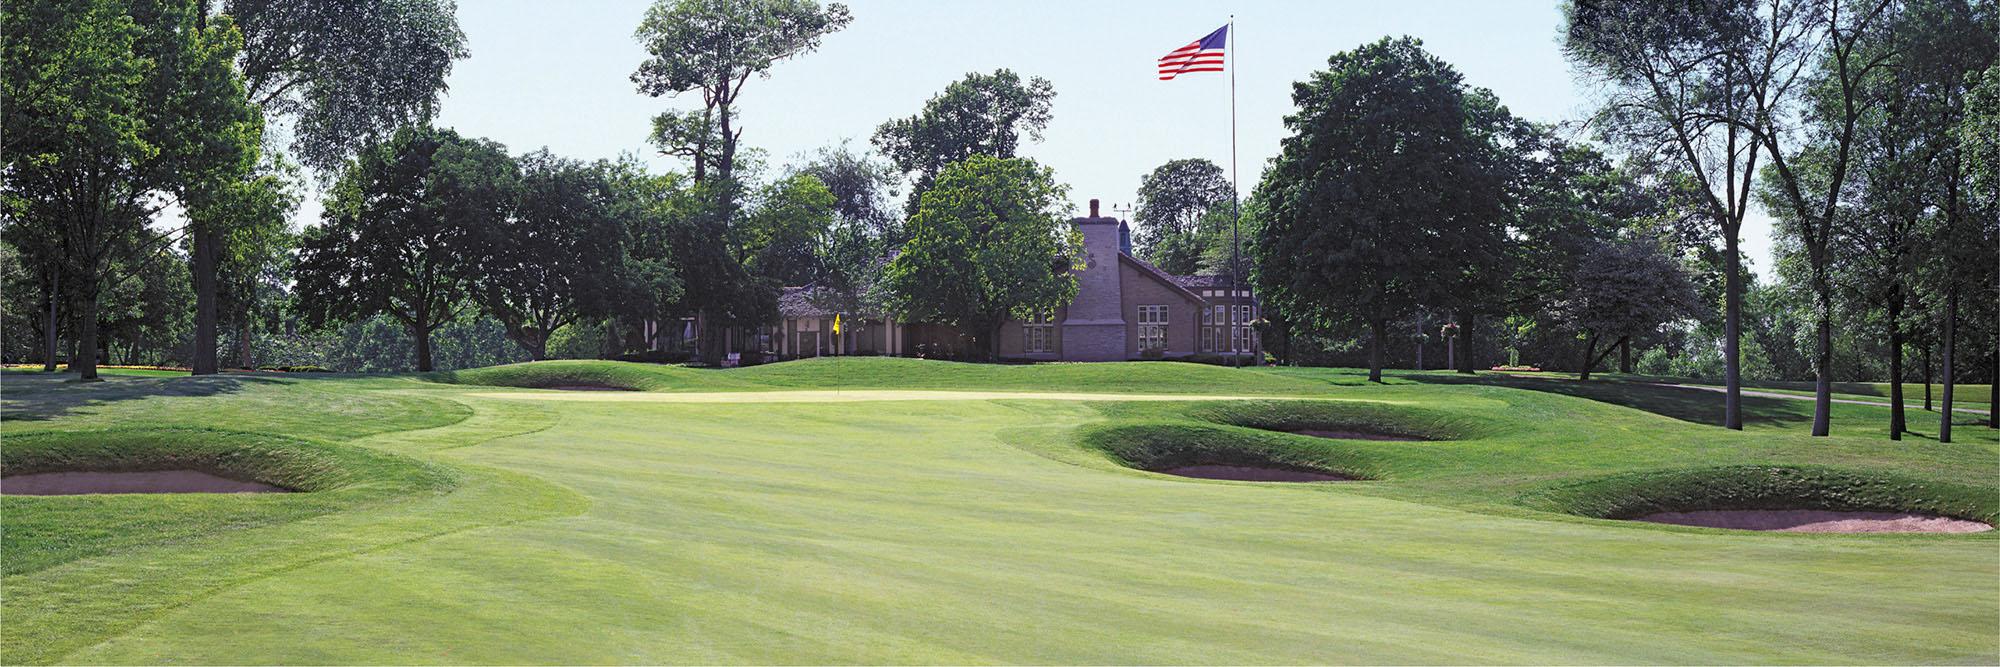 Golf Course Image - Brown Deer Park No. 18